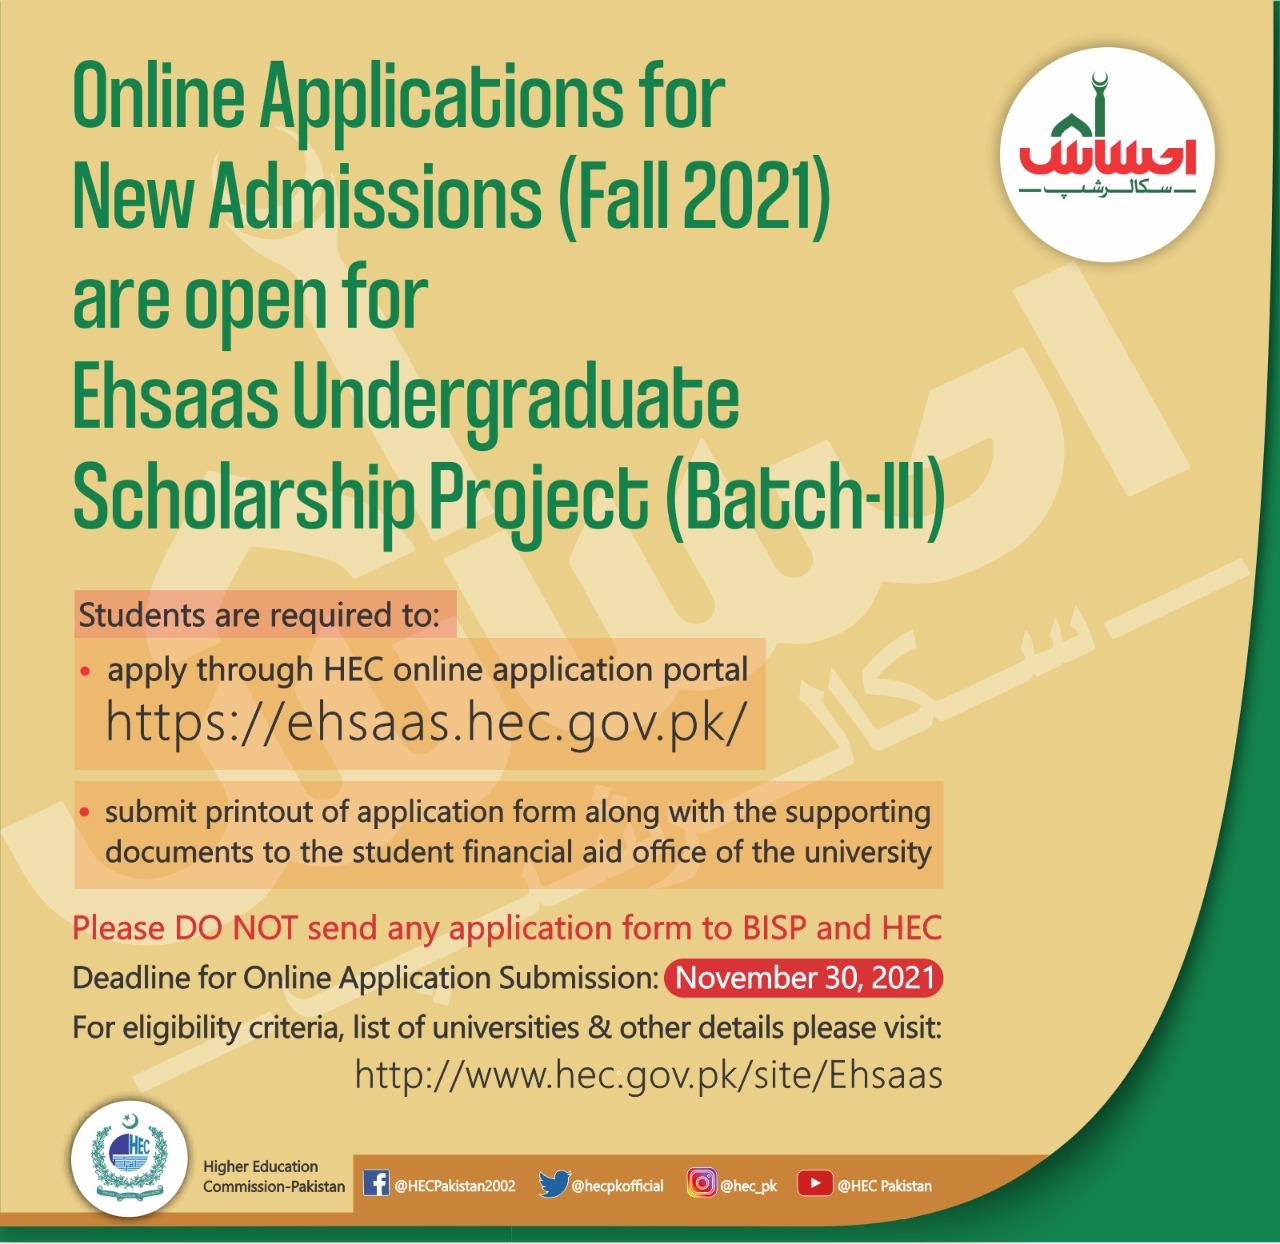 Announcement of Ehsaas Undergraduate Scholarship Program - Phase III